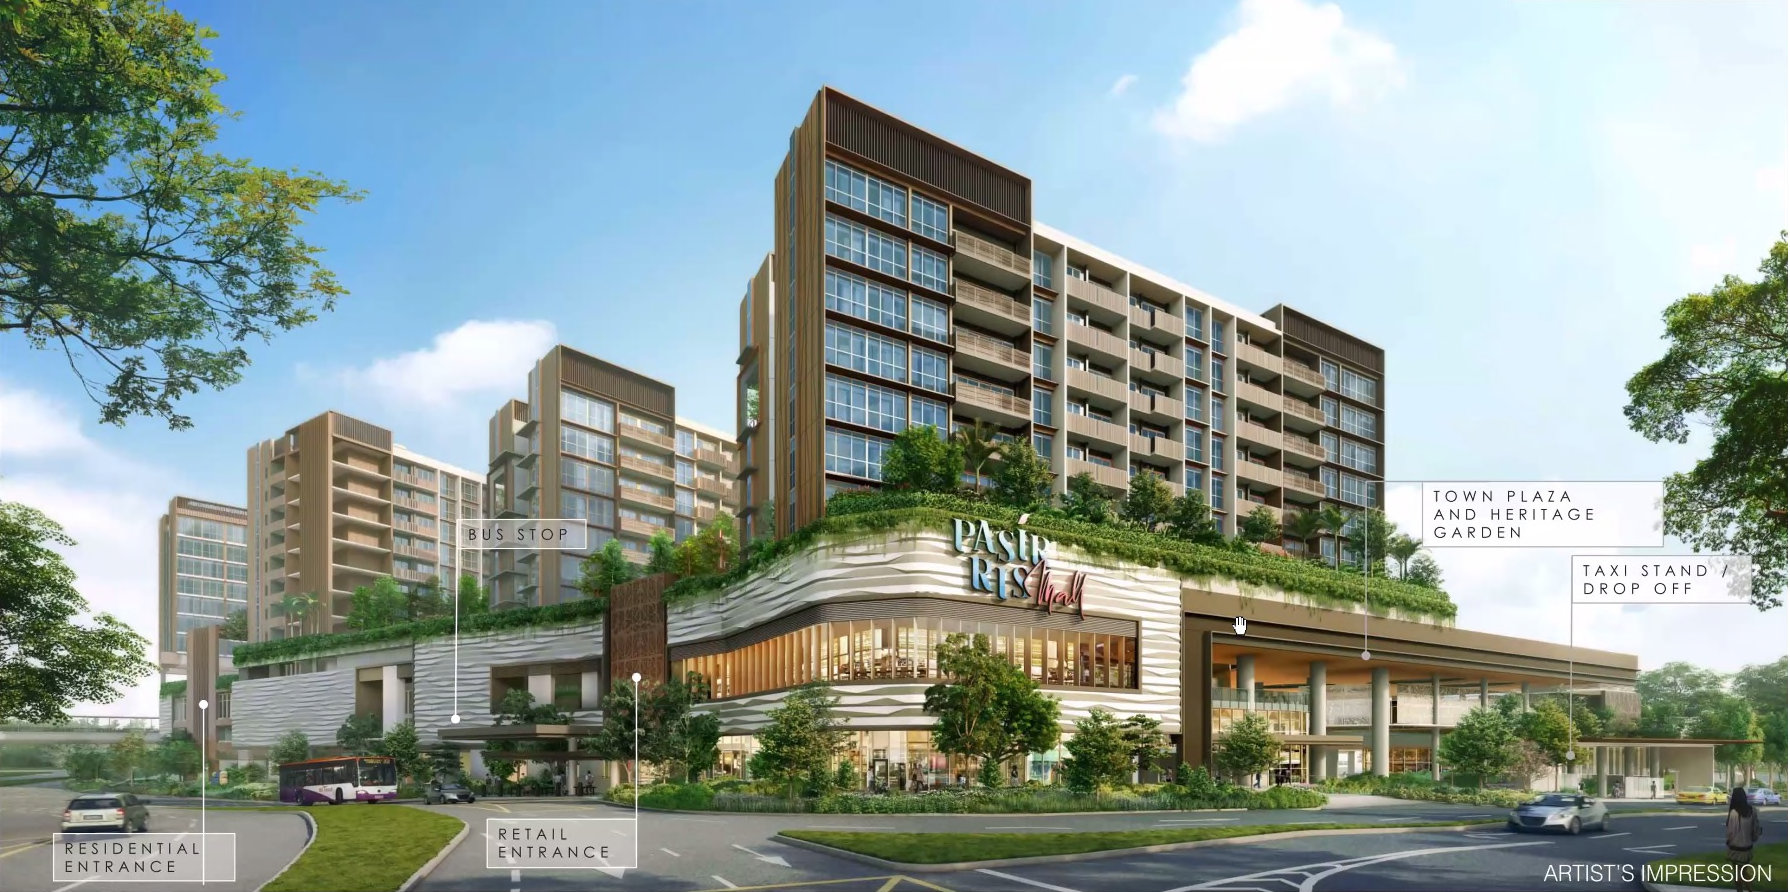 Pasir Ris 8 Development . Street View